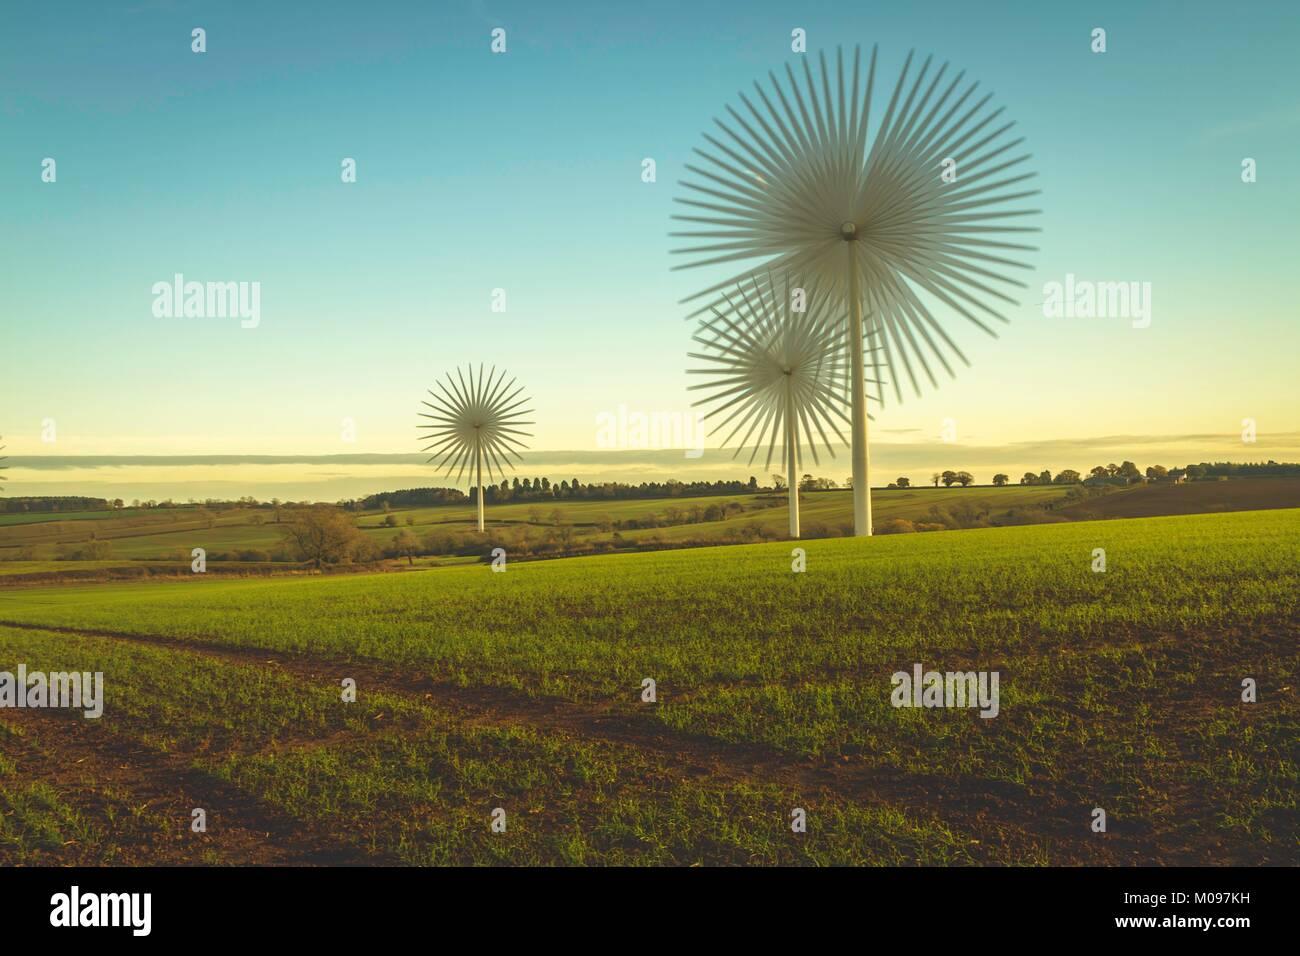 Wind Turbine Flower Power - Stock Image